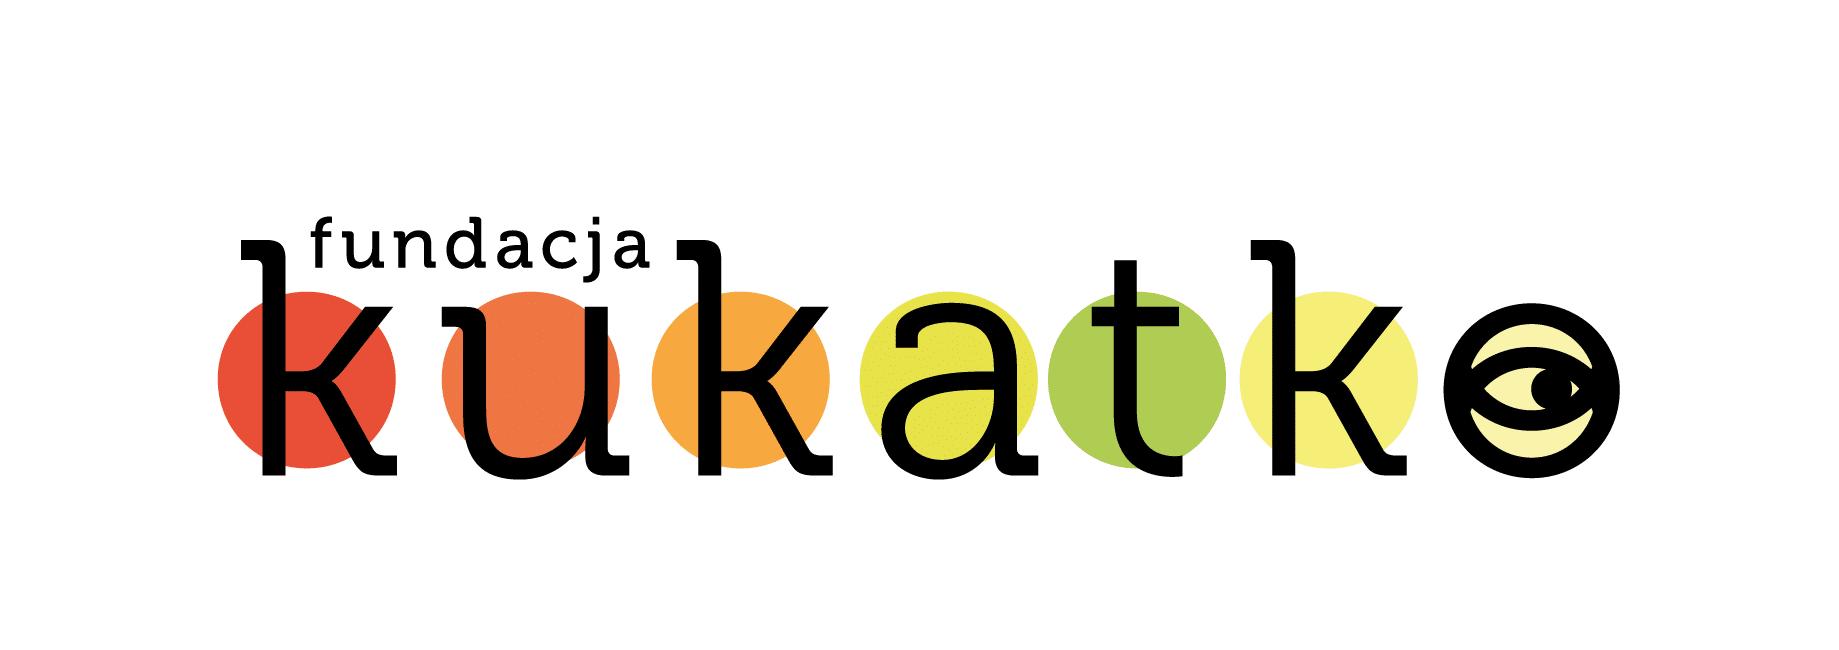 Logotyp fundacji Kukatko